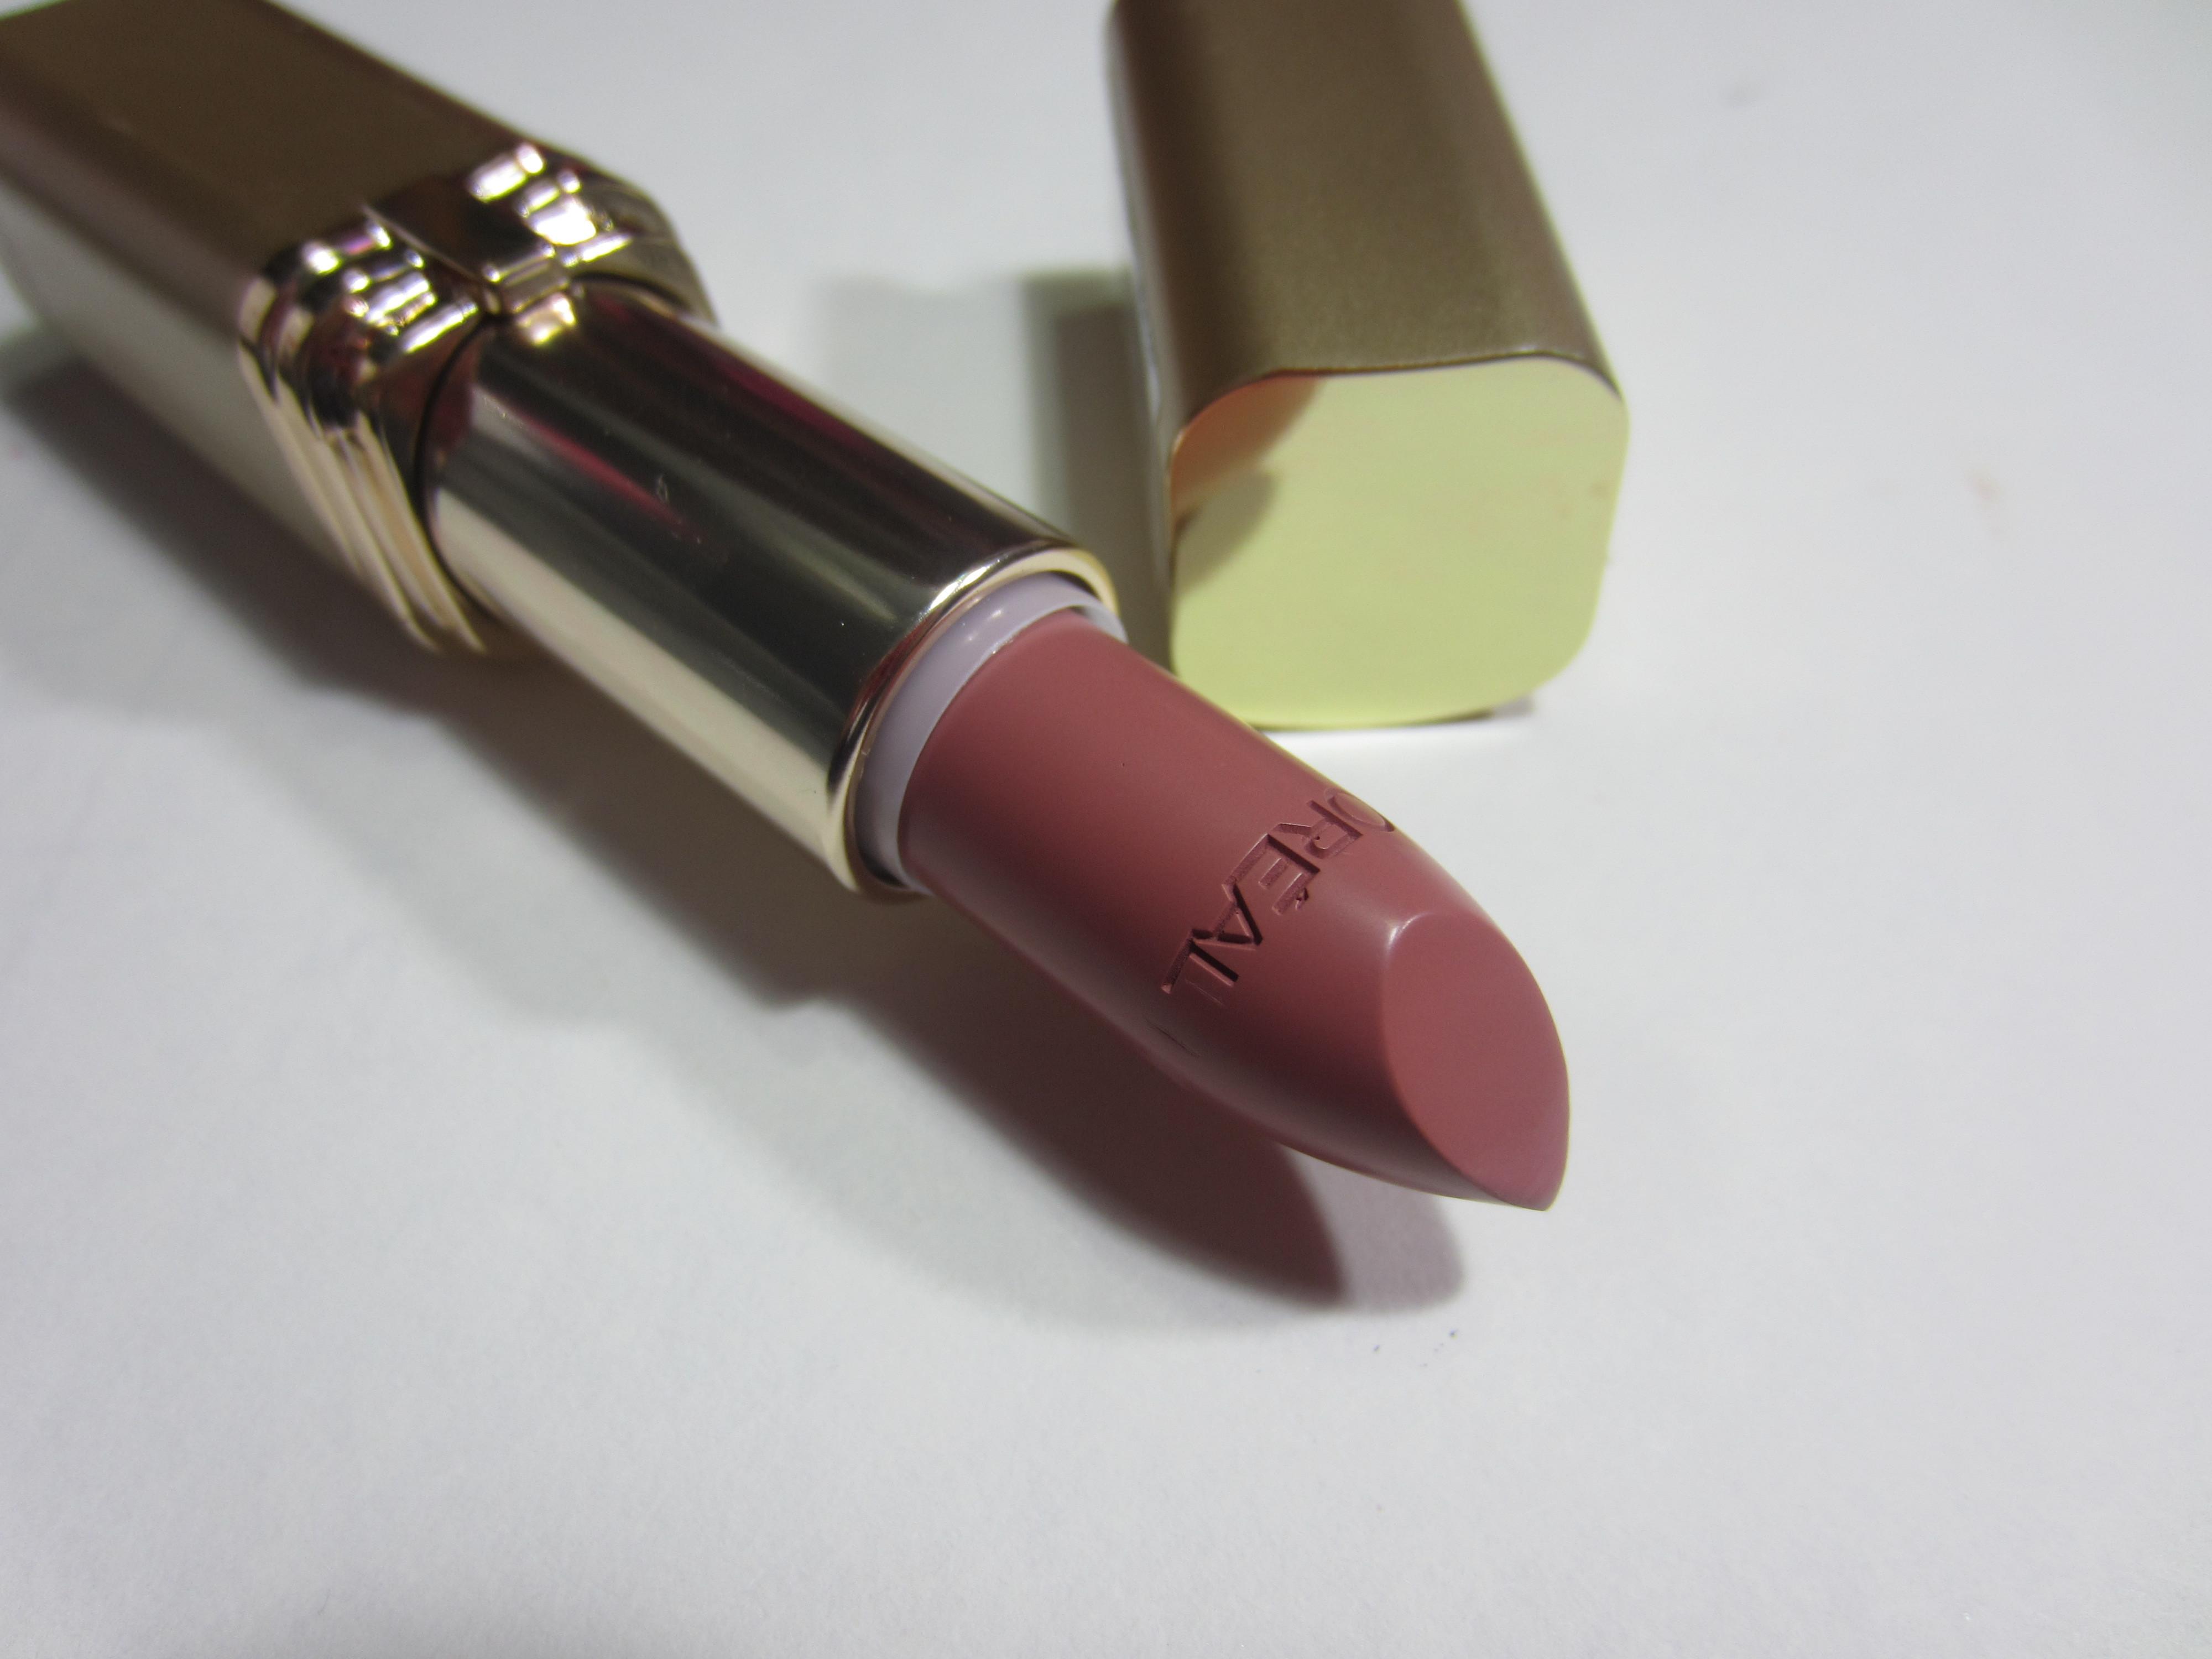 LOreal Colour Riche Lipcolour, 800 Fairest Nude